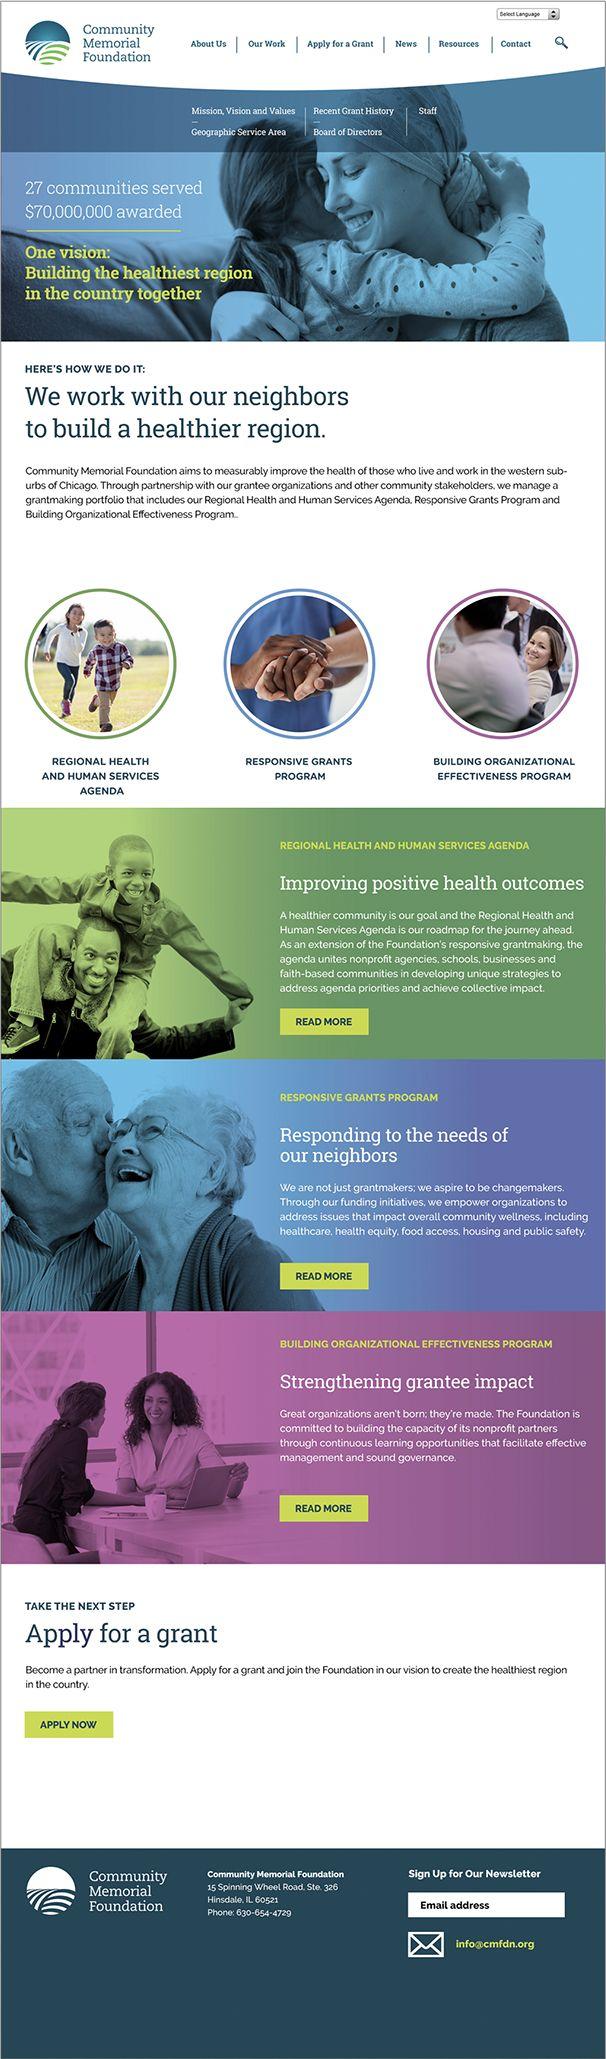 Community Memorial Foundation website 1